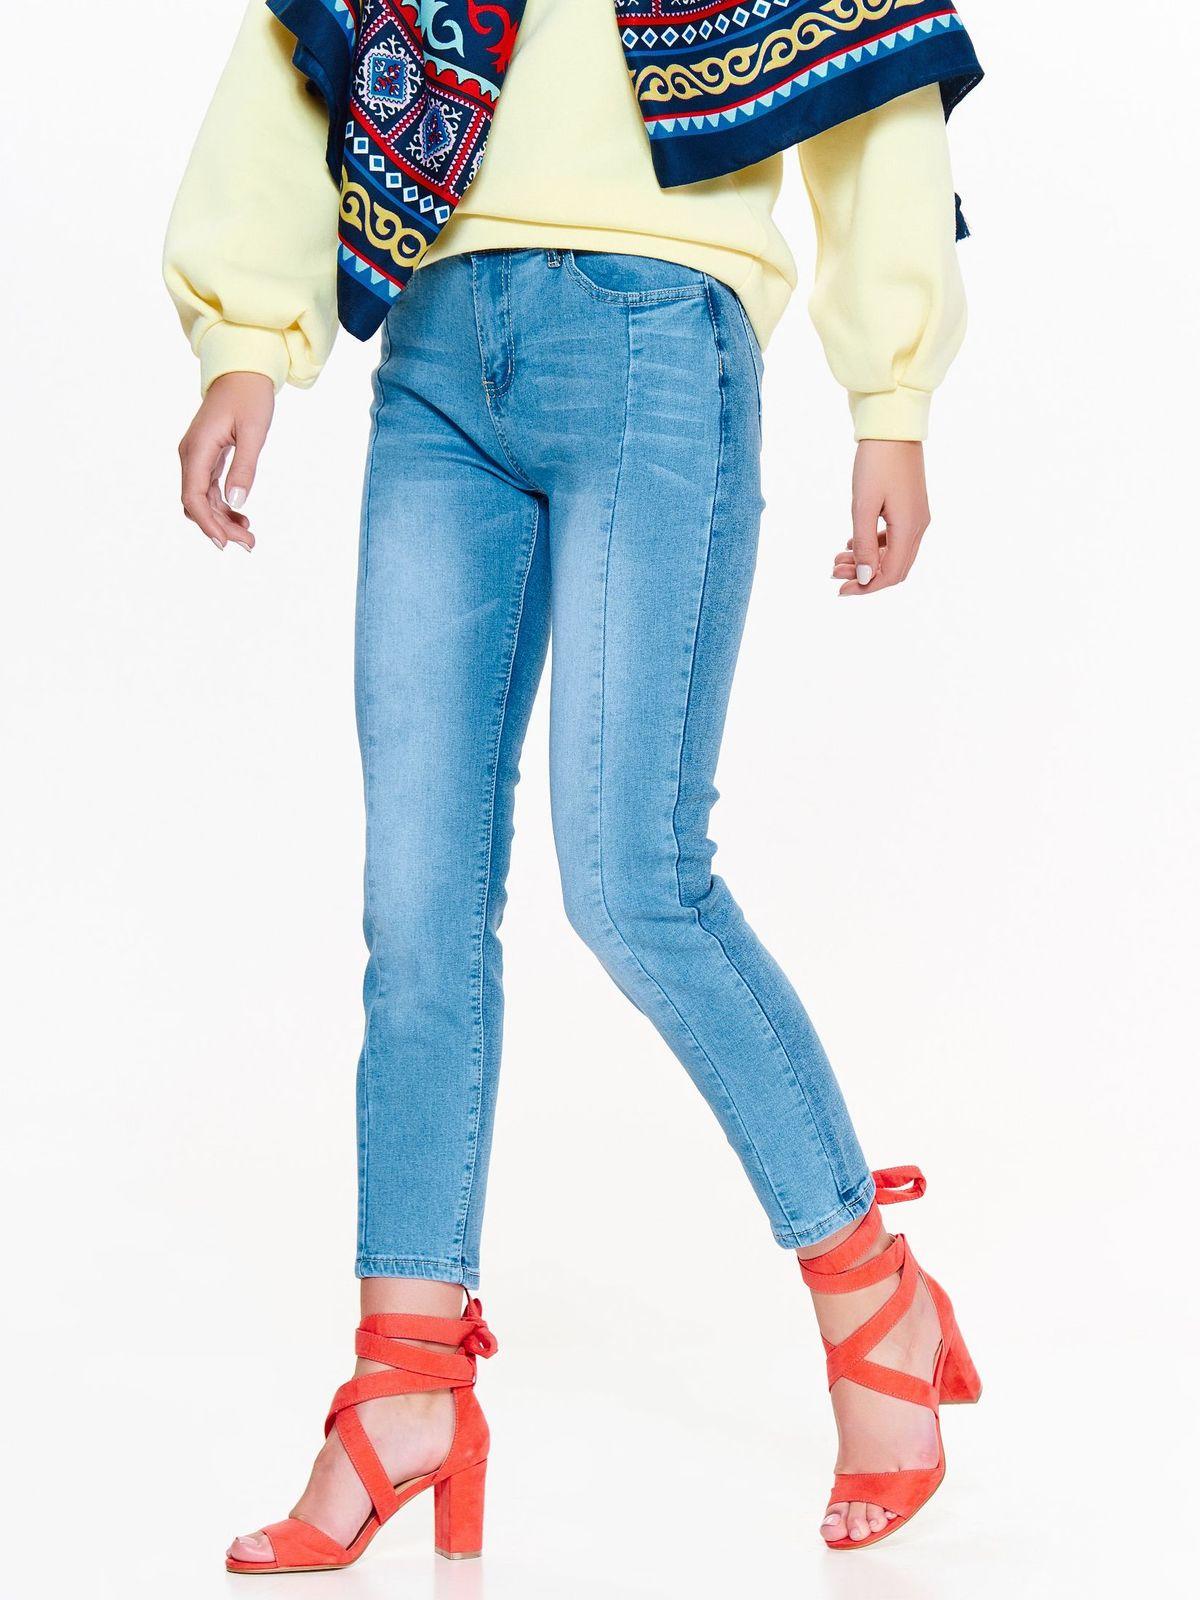 TOP SECRET TOP SECRET γυναικειο jean παντελονι